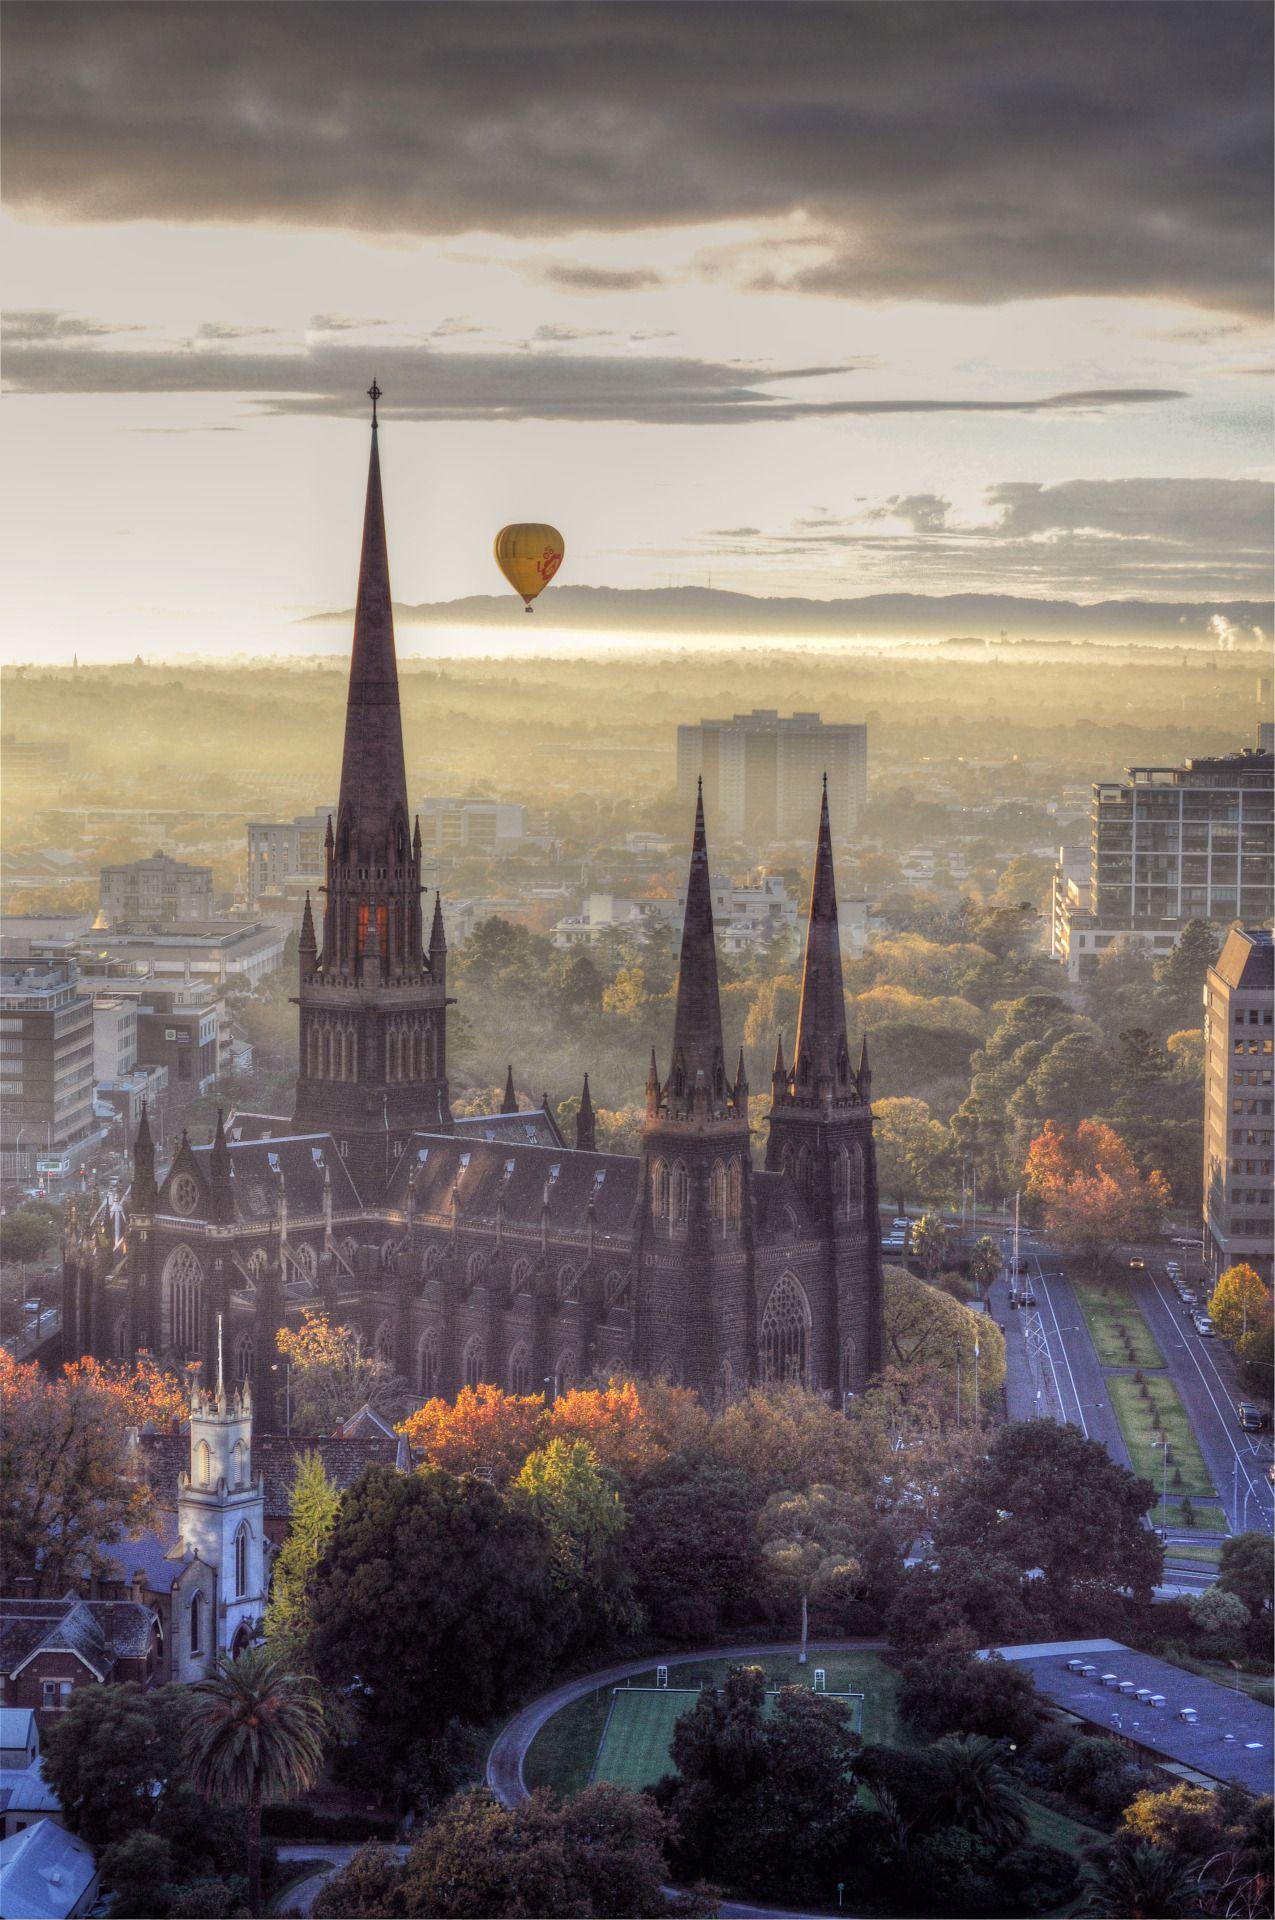 Melbourne Australia. Beautiful. Melbourne photography, Melbourne city, Melbourne photos.